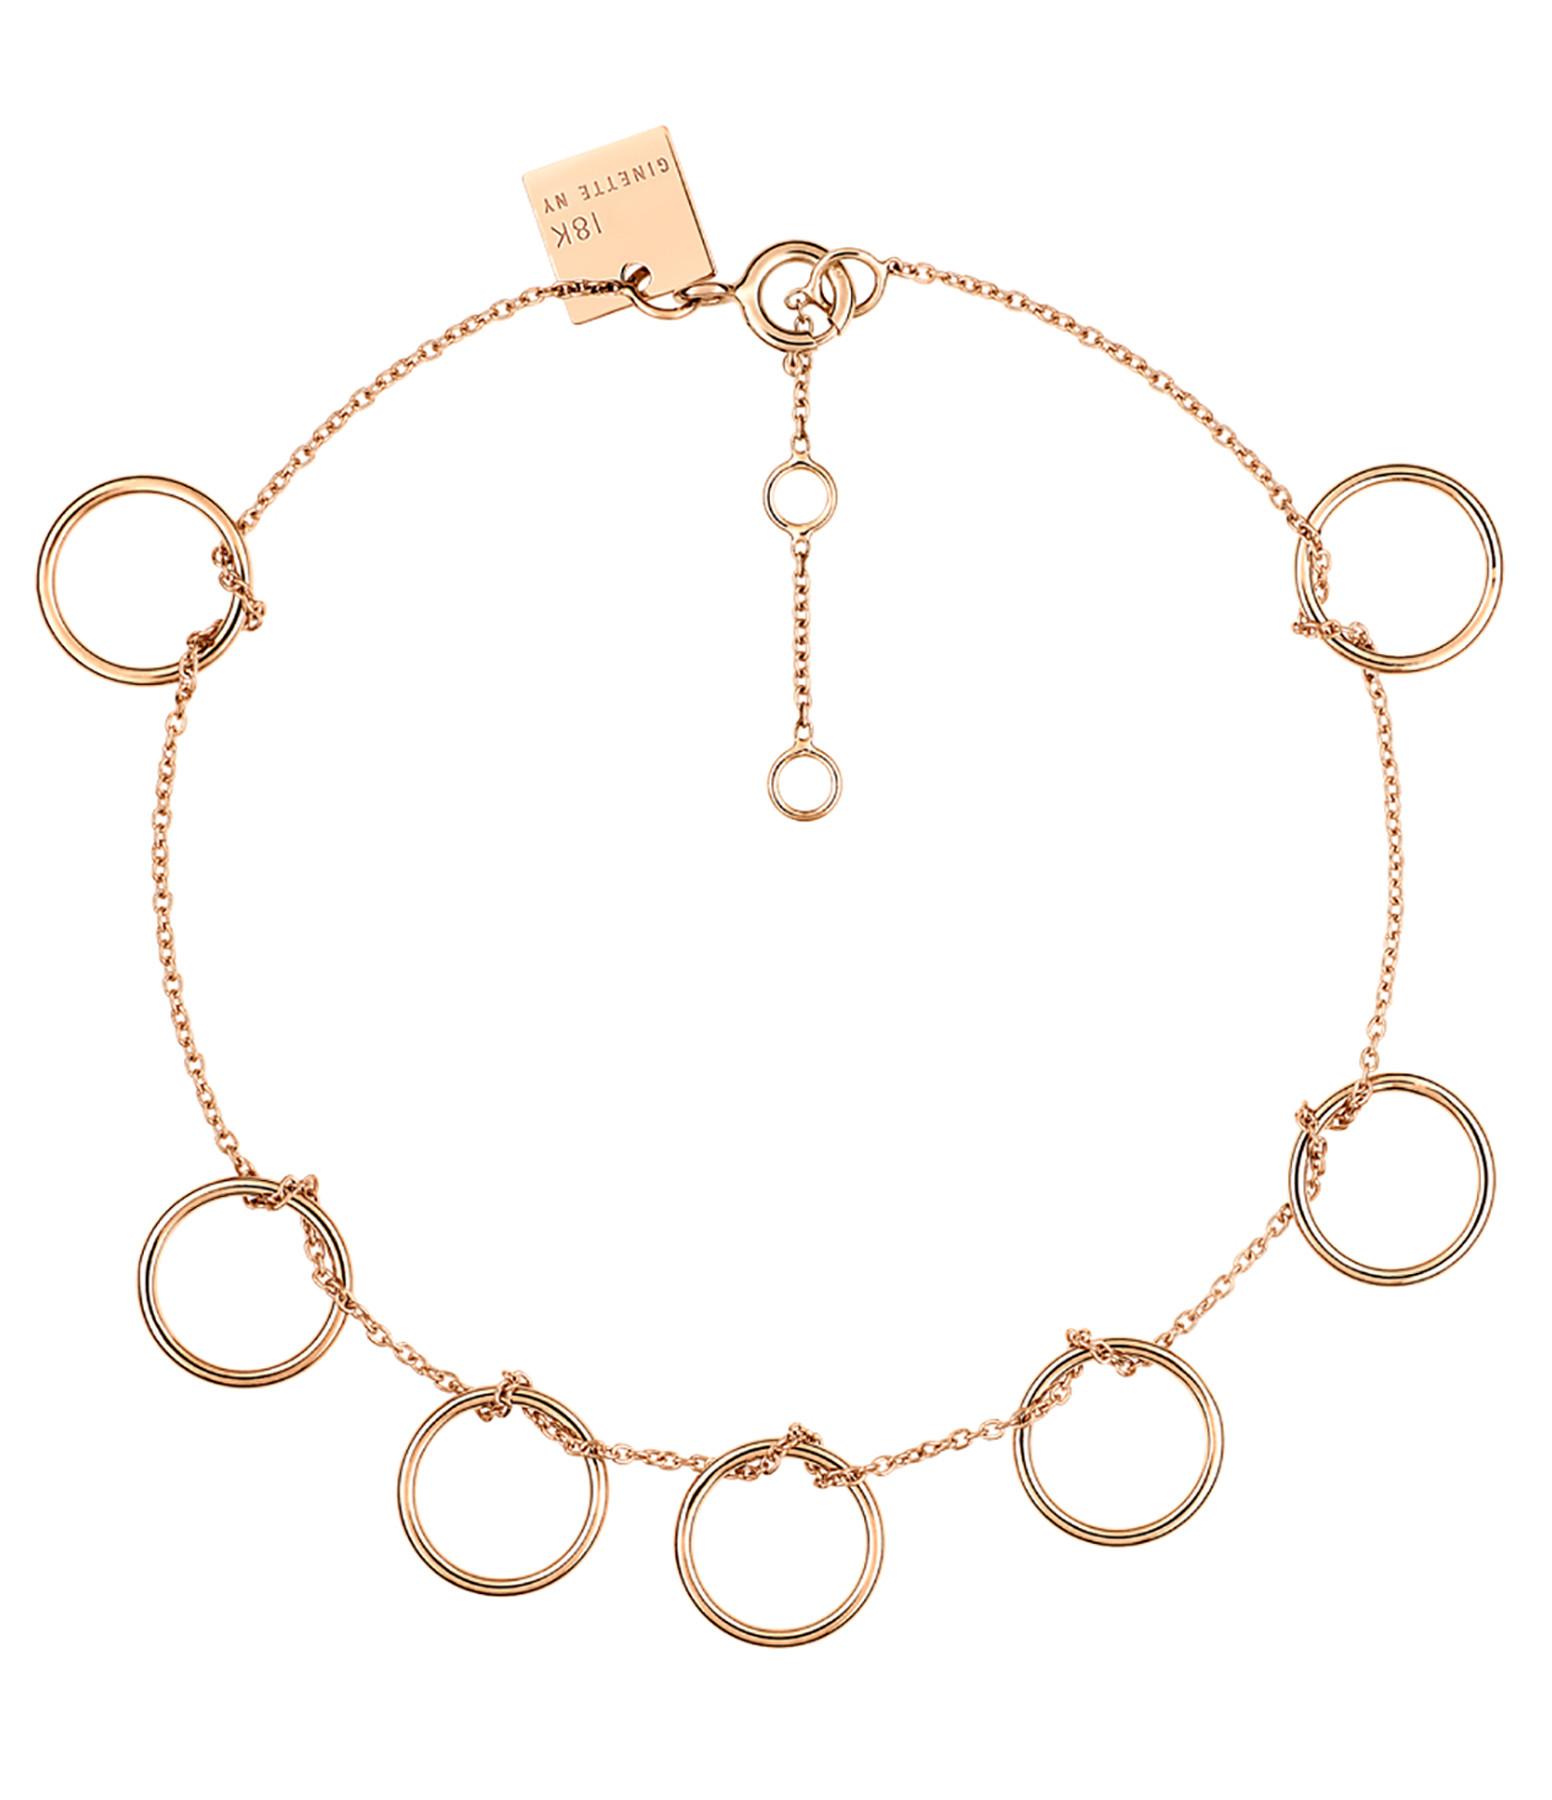 GINETTE NY - Bracelet Tiny 7 Cercles Or Rose